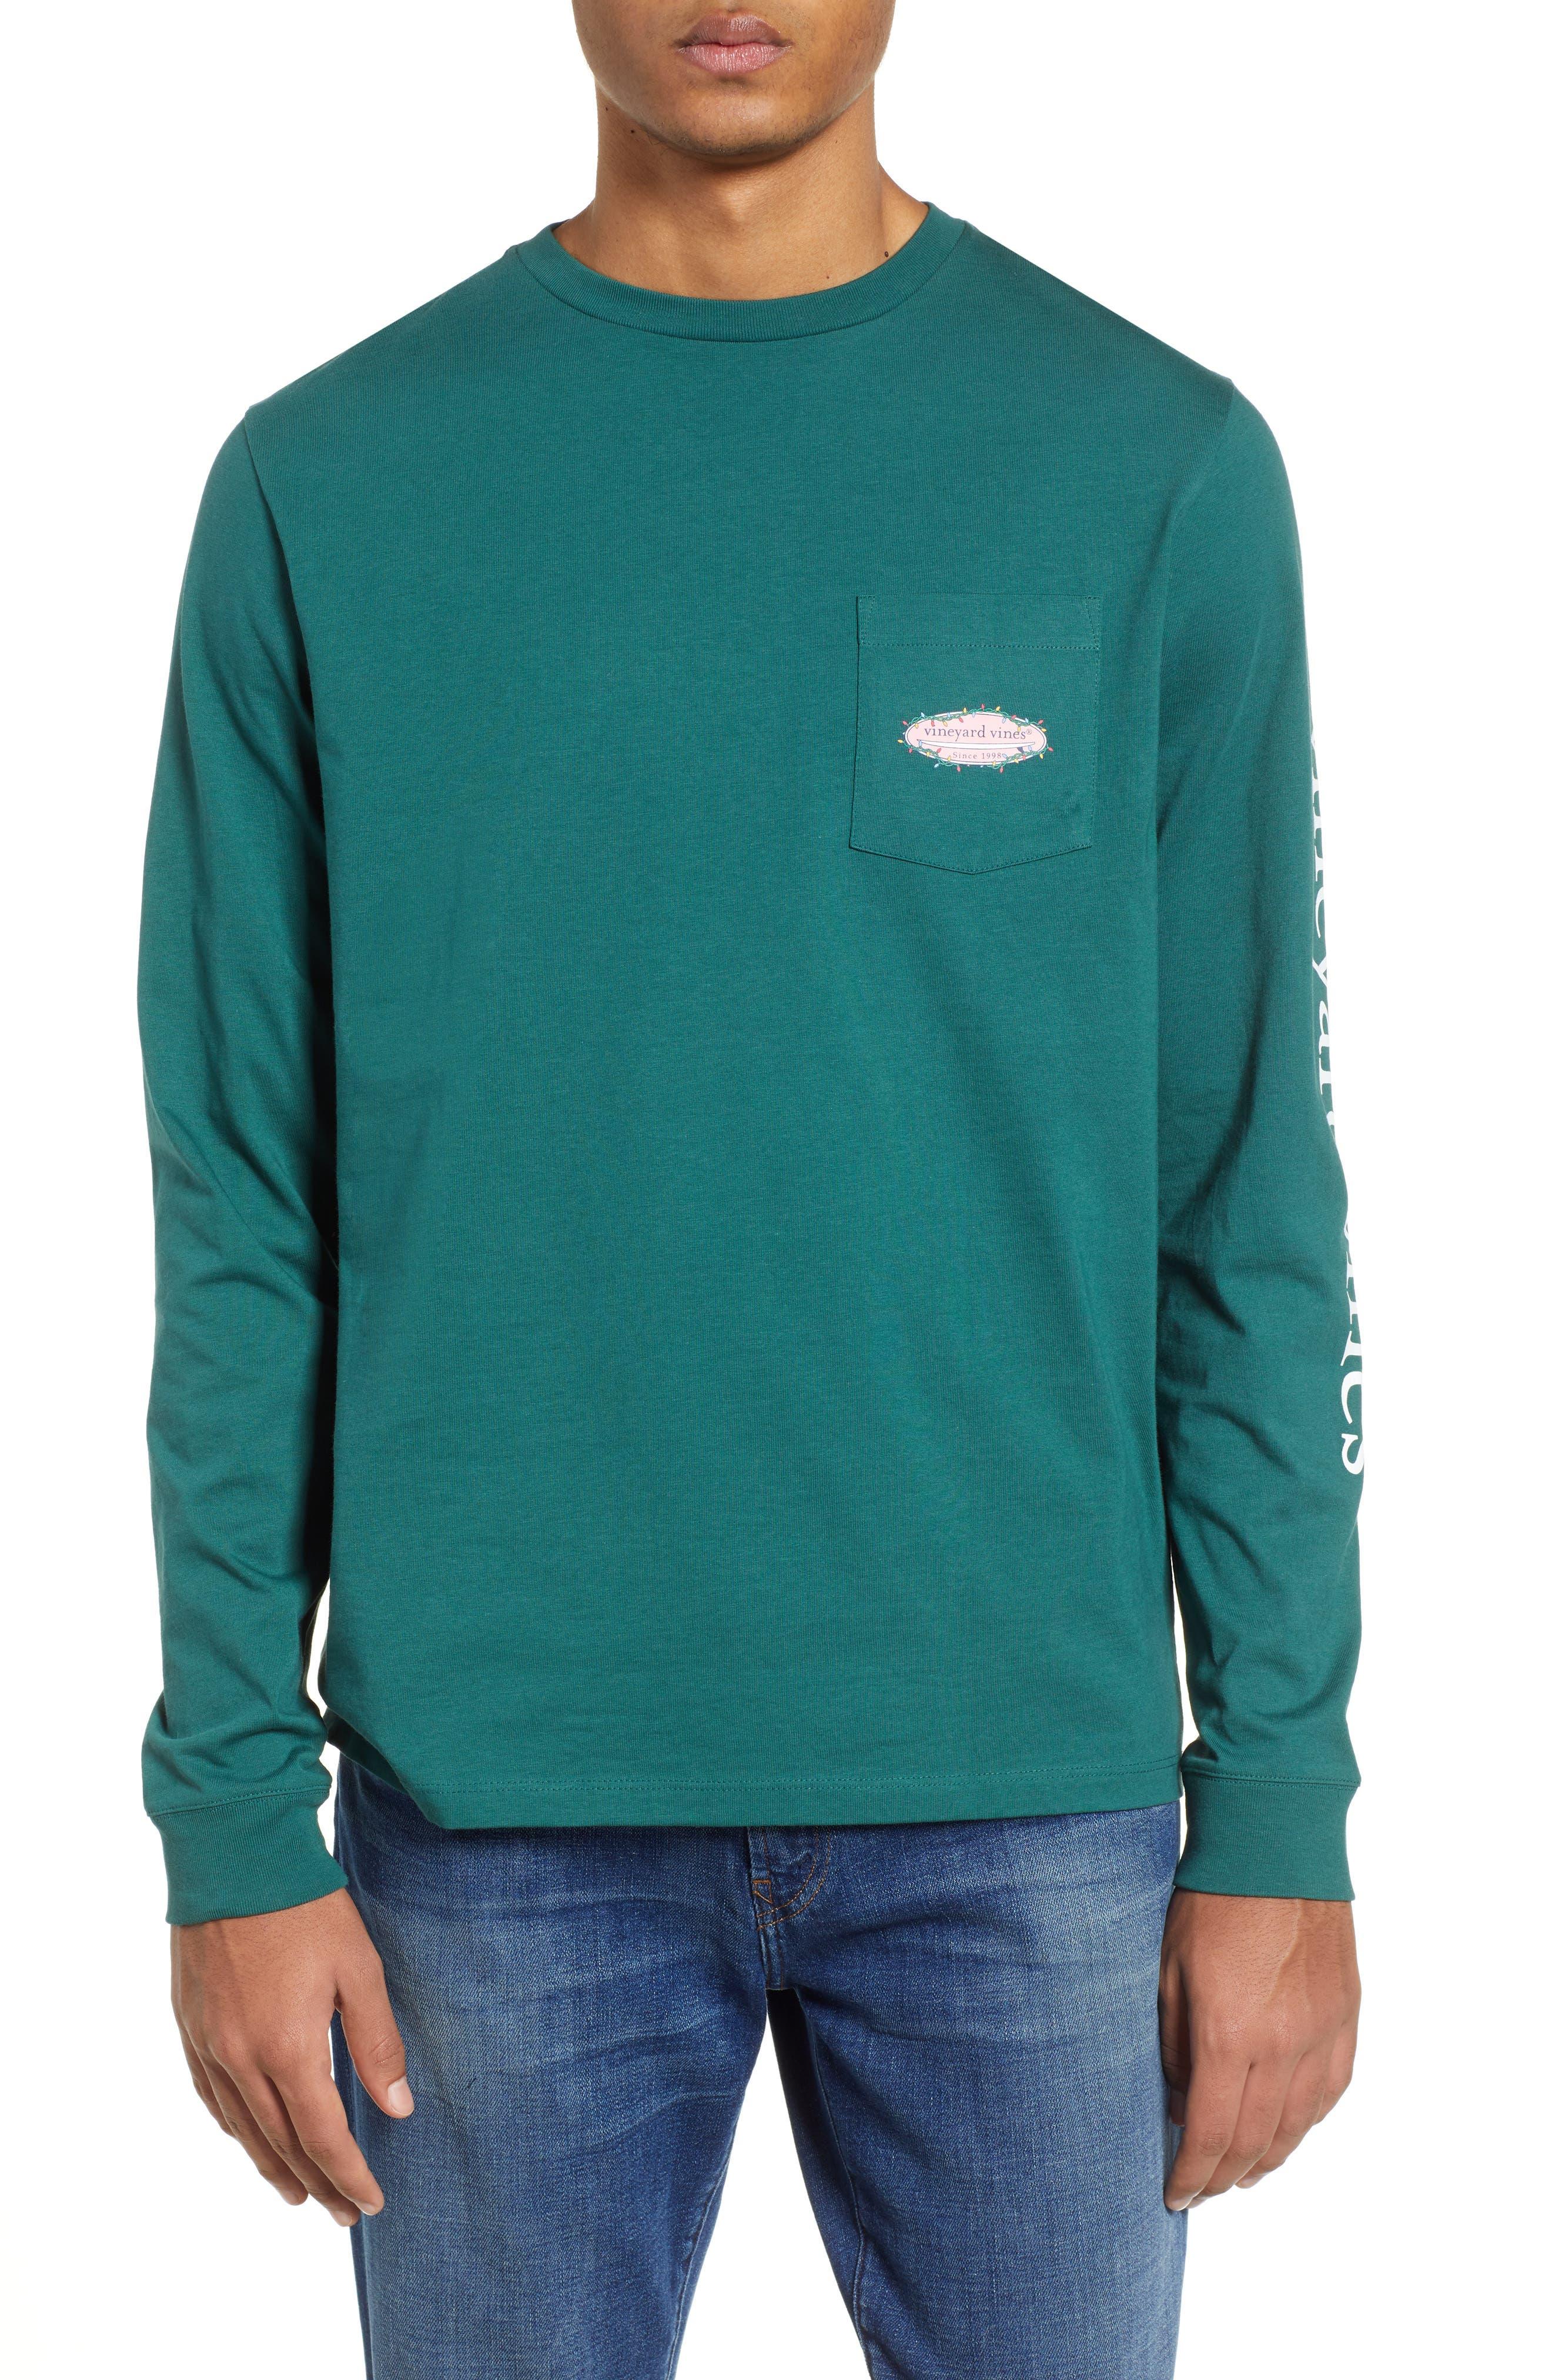 Vineyard Vines Surf Lights Pocket T-Shirt, Green